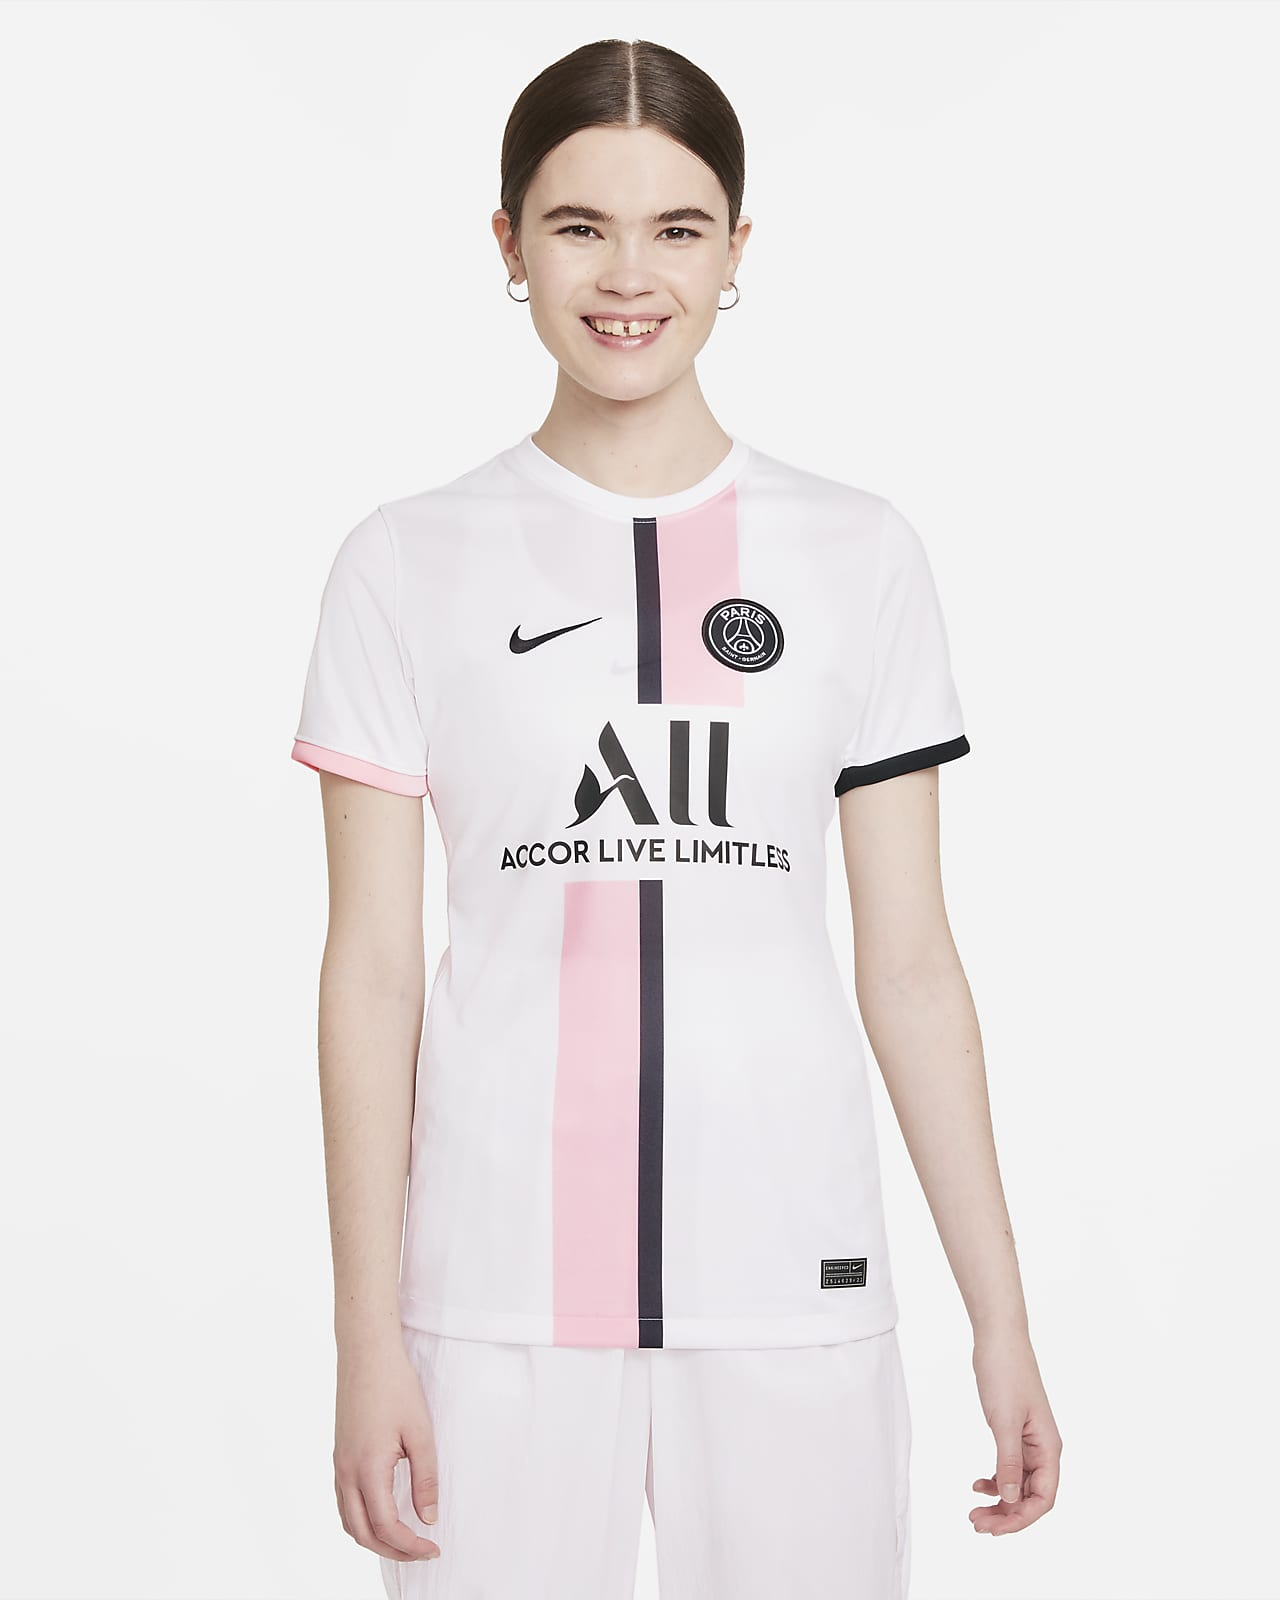 Jersey de fútbol Nike Dri-FIT del Paris Saint-Germain visitante 2021/22 Stadium para mujer